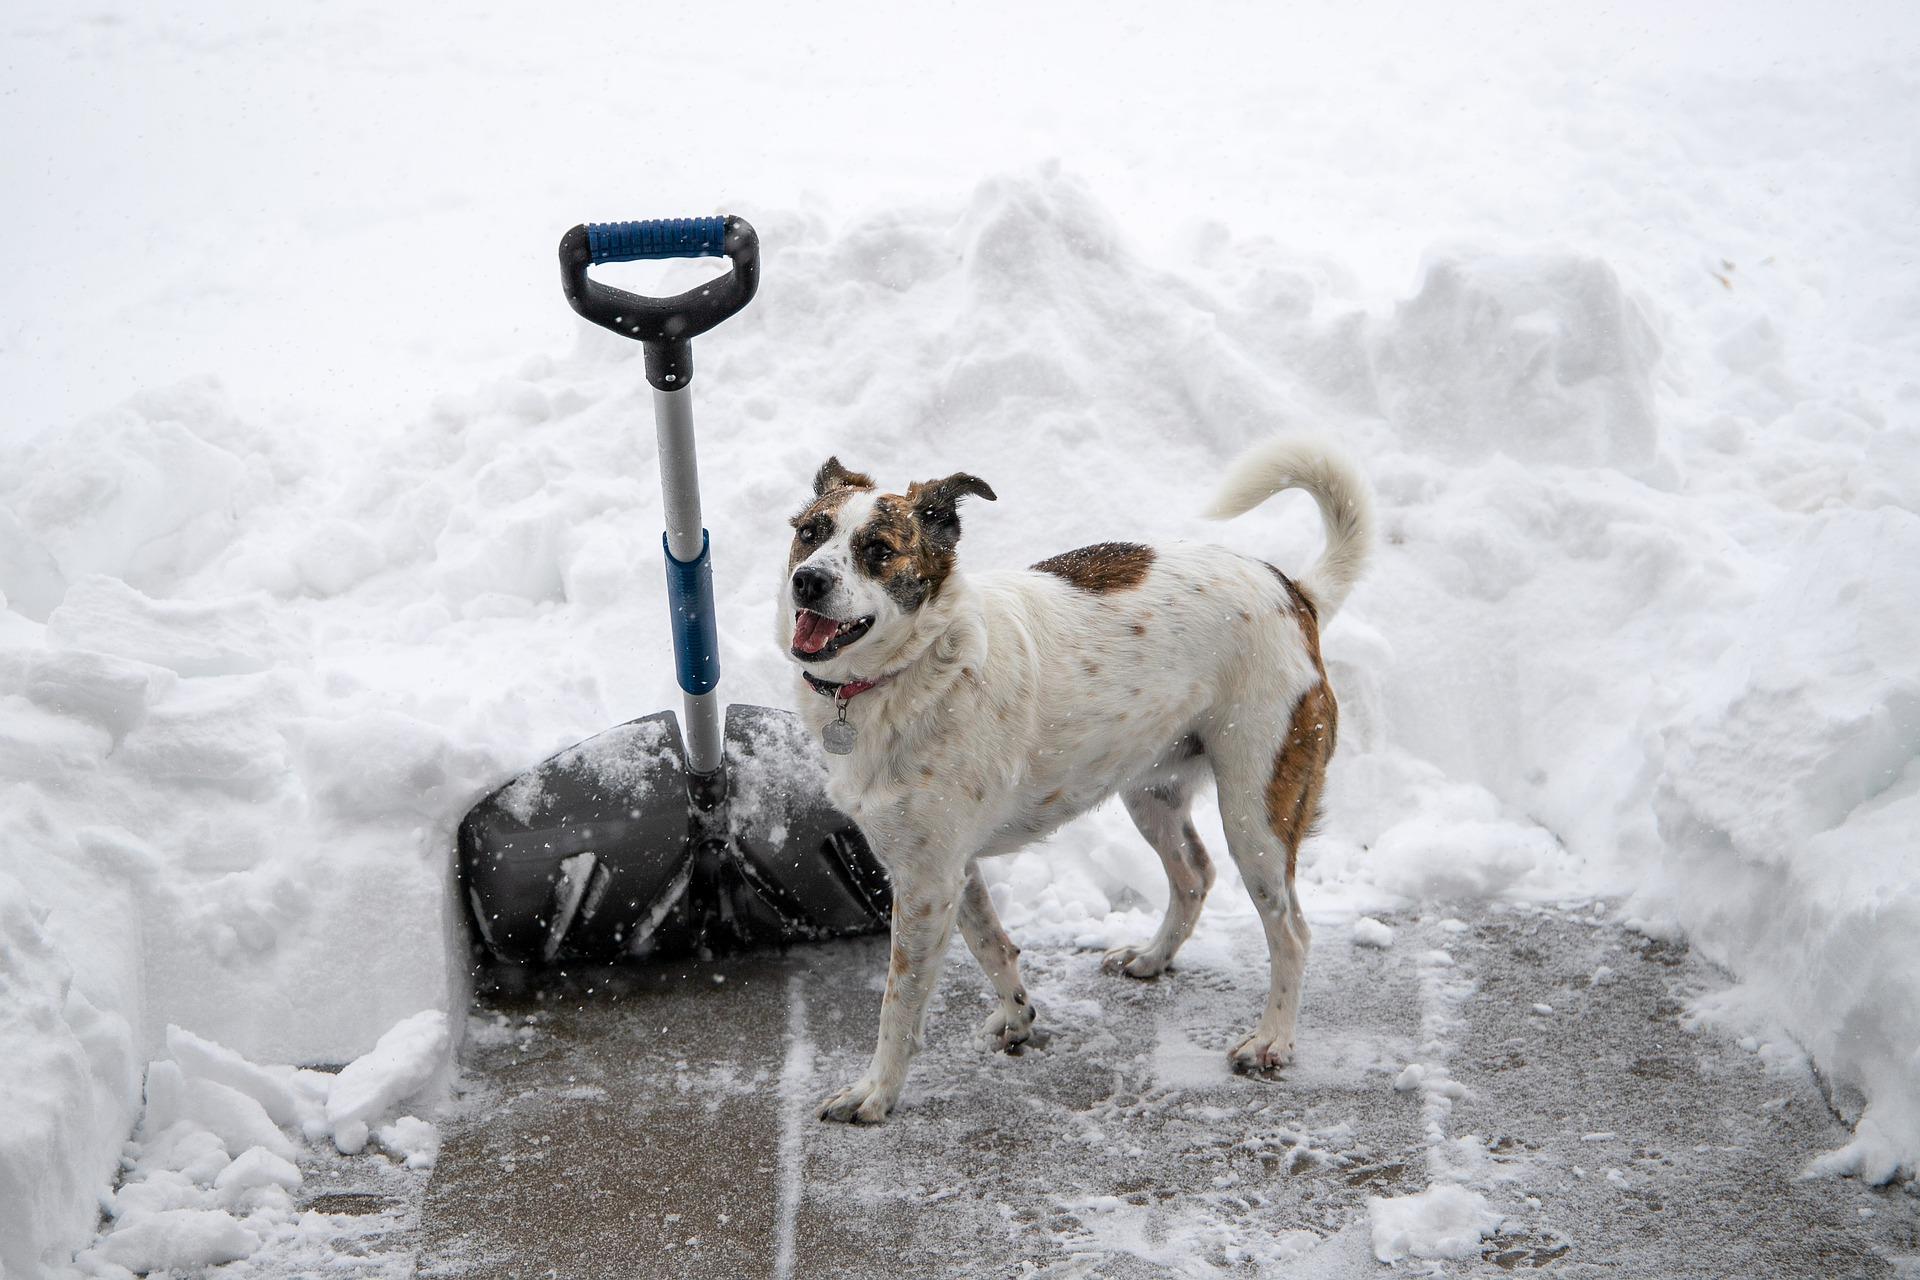 Dog with snow shovel